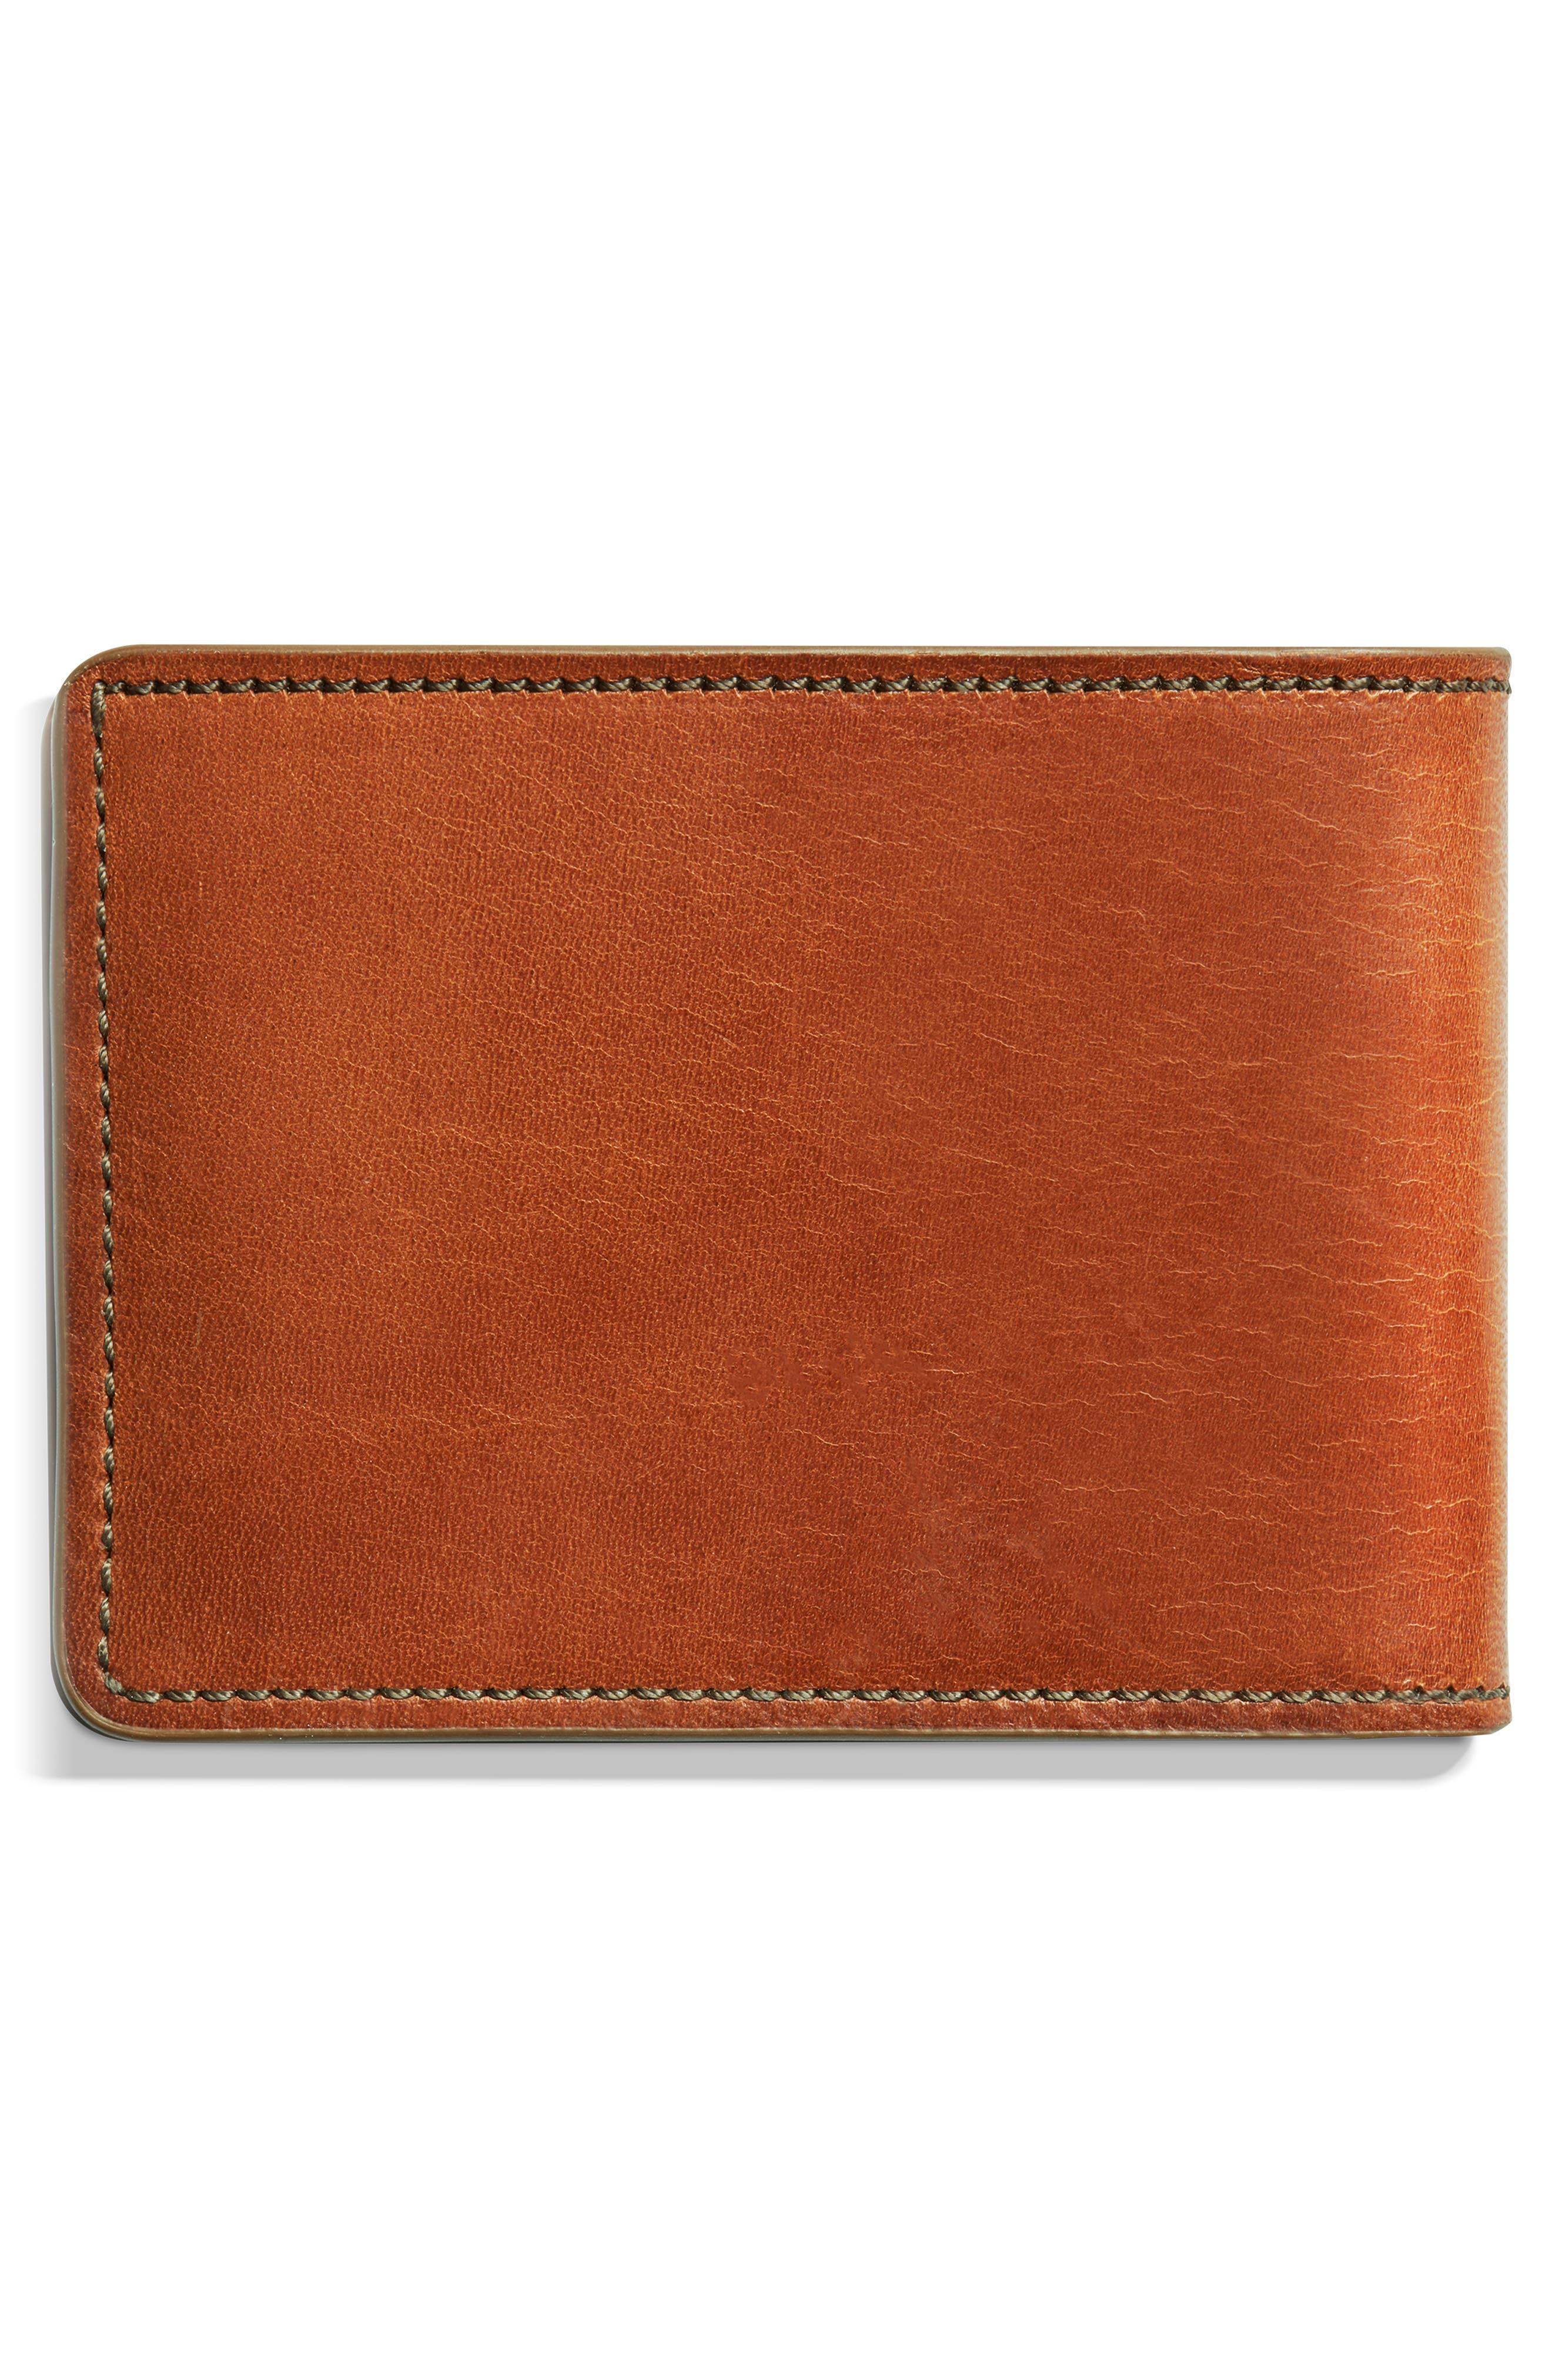 SHINOLA, Harness Slim 2.0 Bifold Leather Wallet, Alternate thumbnail 3, color, BOURBON